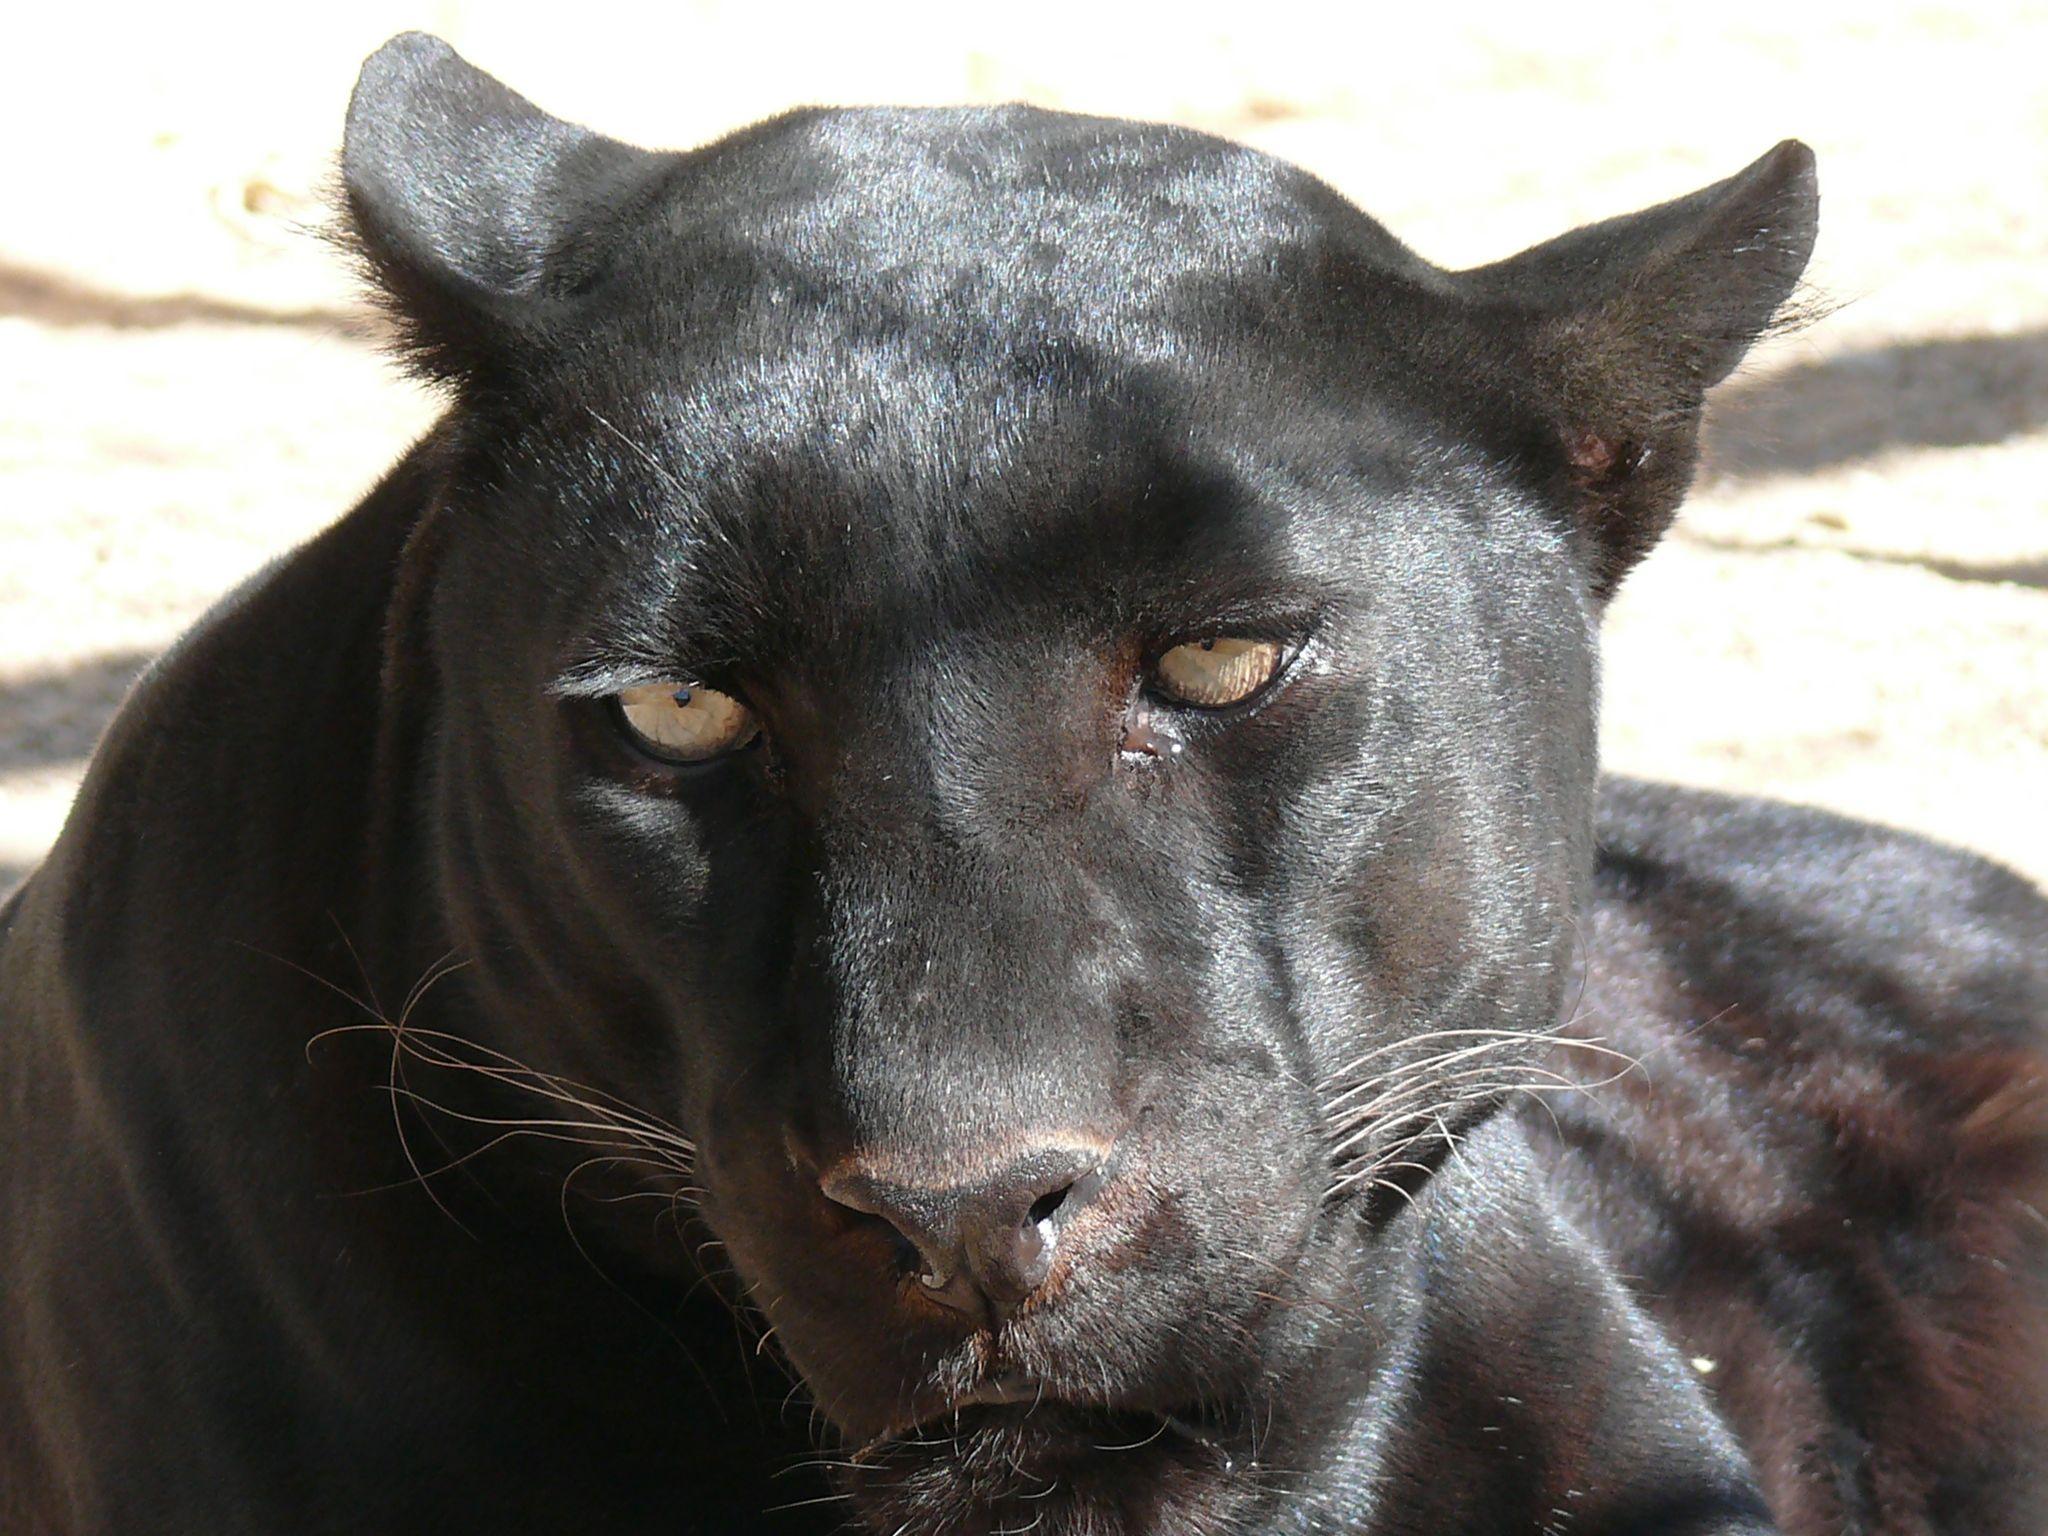 La Pantera Negra: Una Pantera De Verano